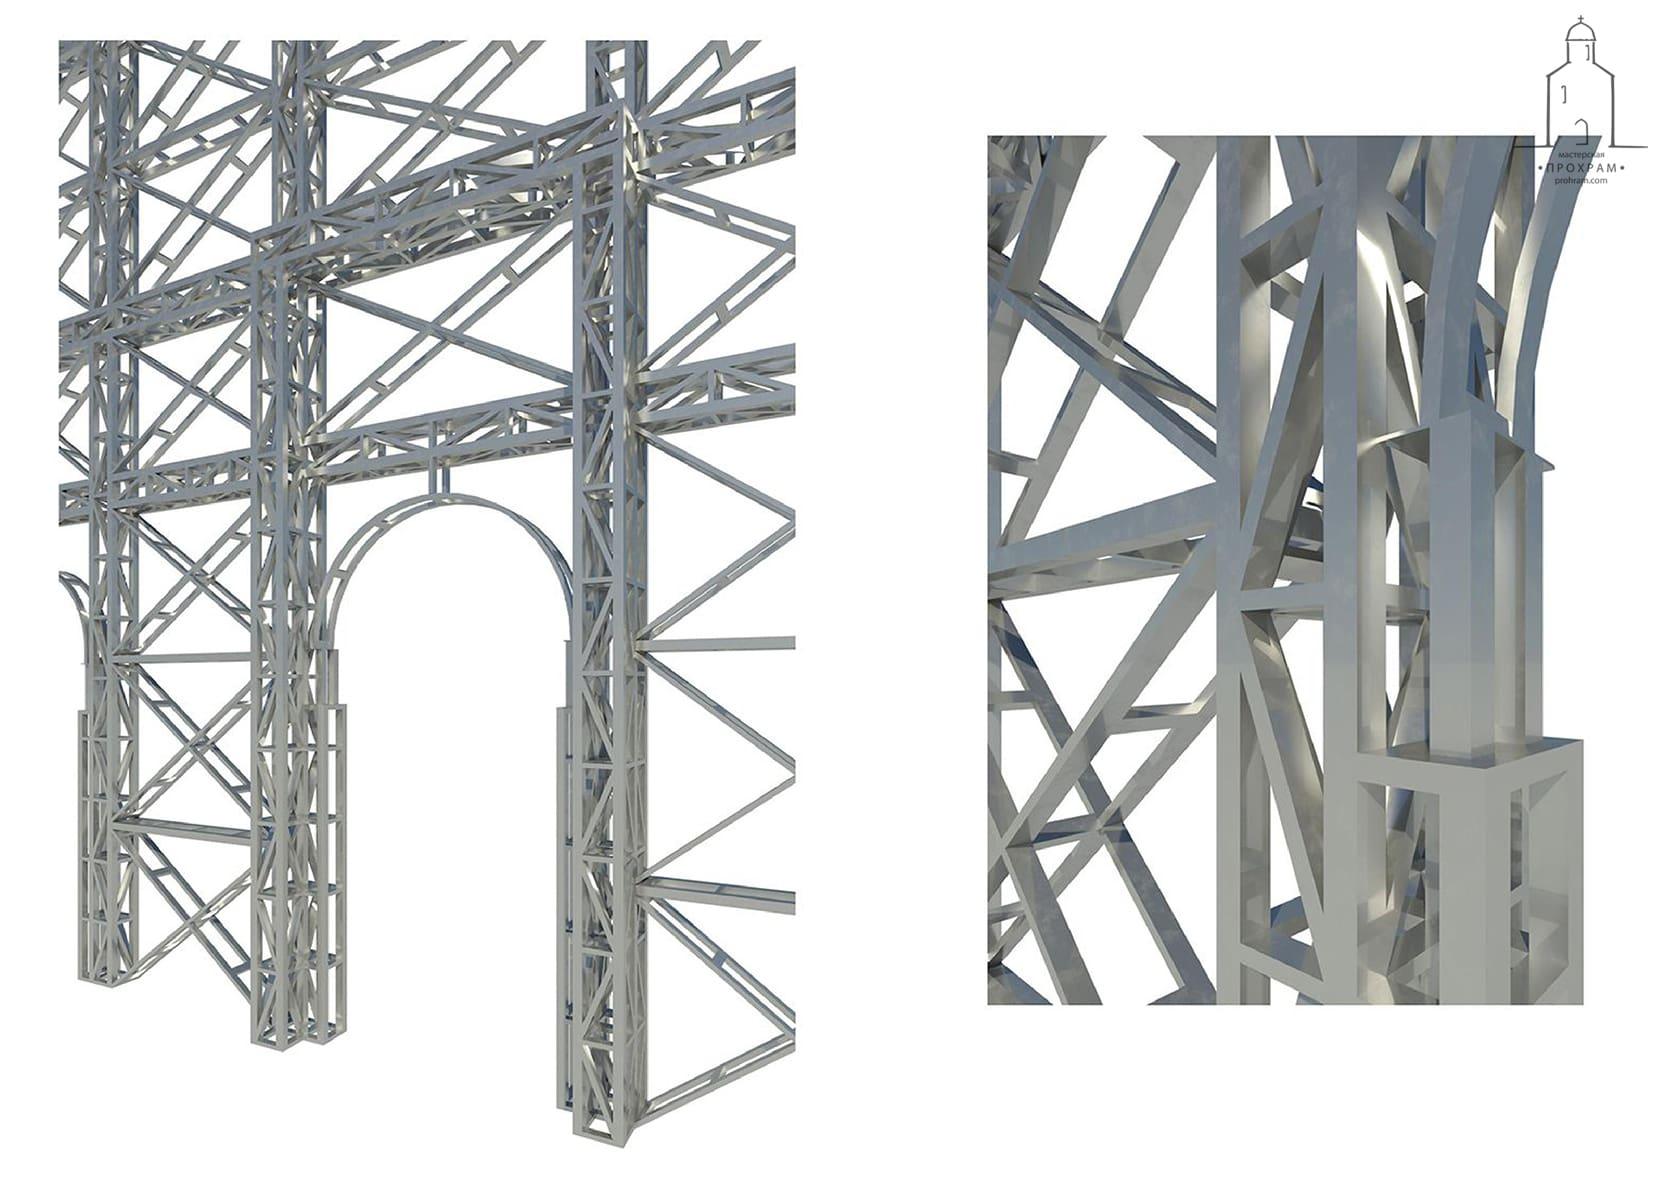 iconostasis project, orthodox architecture, sacred architecture,sketch design